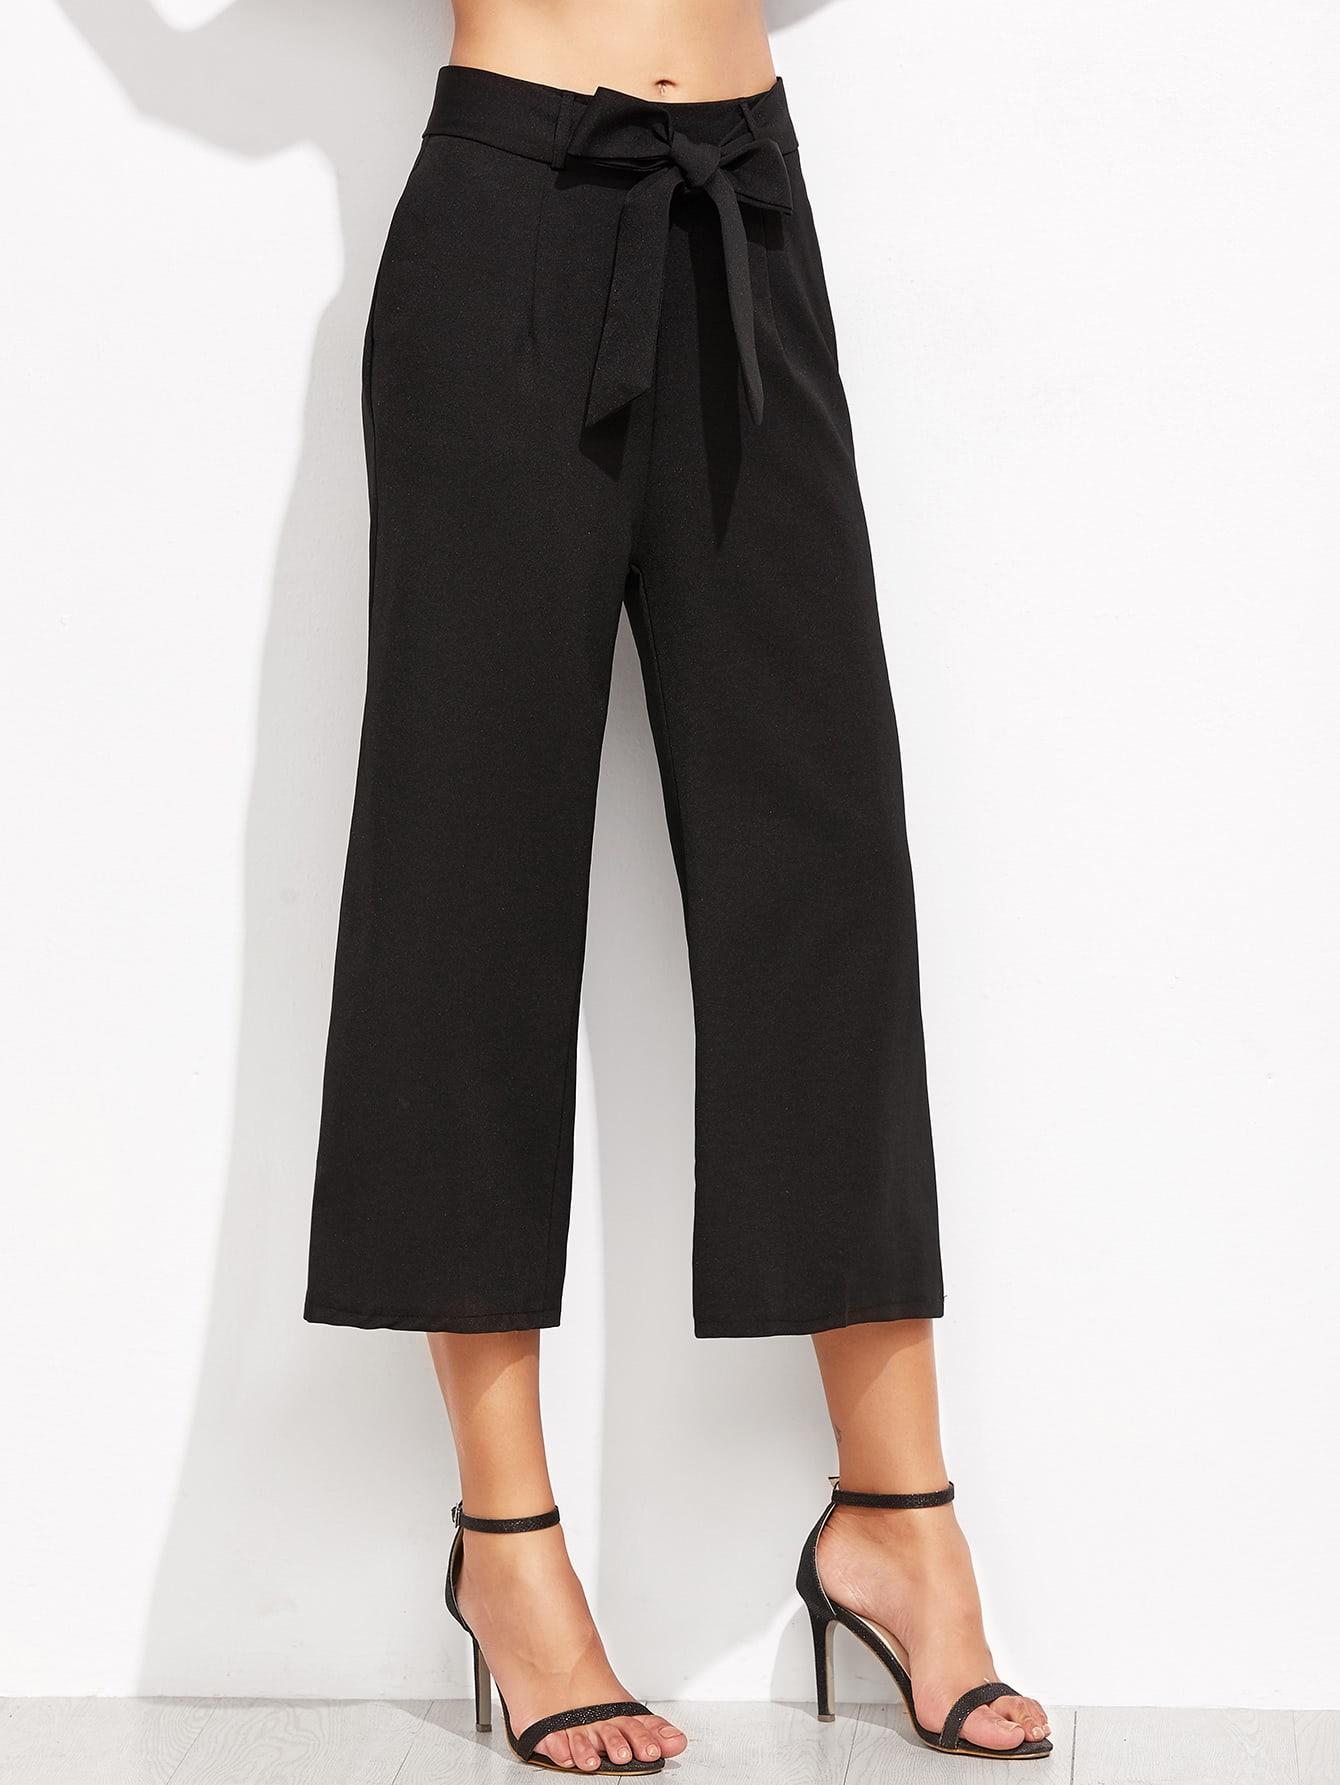 Image of Cropped Self Tie Wide Leg Pants